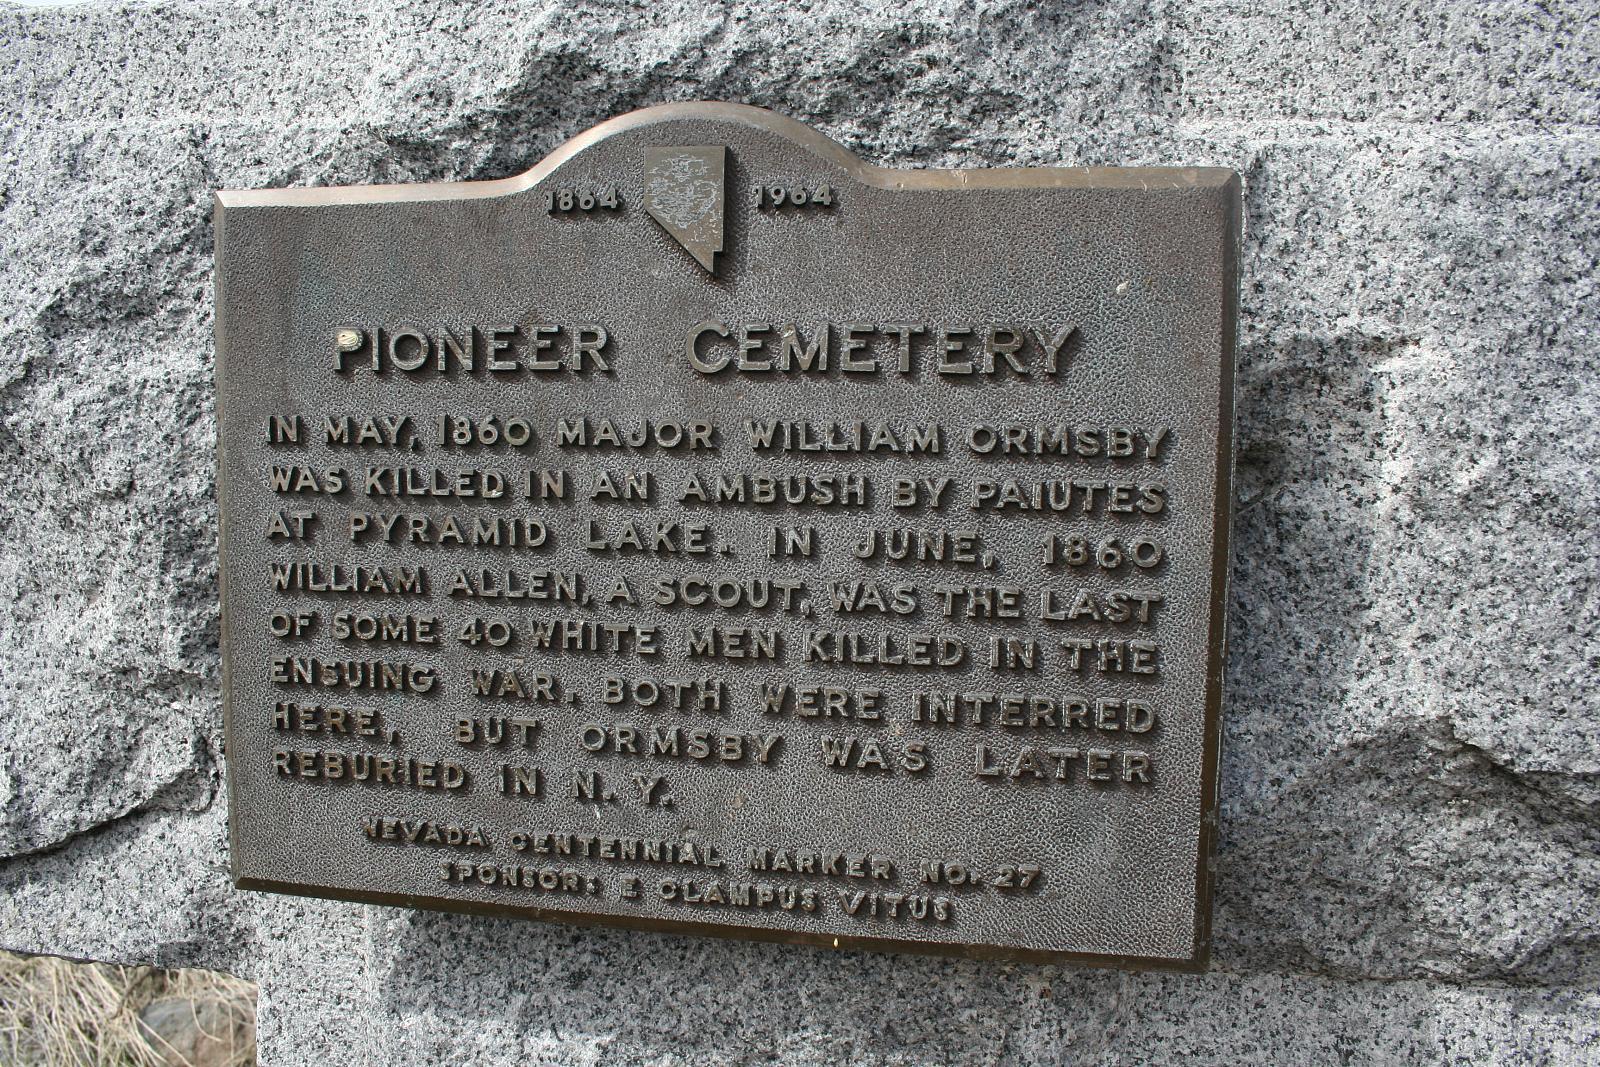 Pioneer Cemetery Plaque